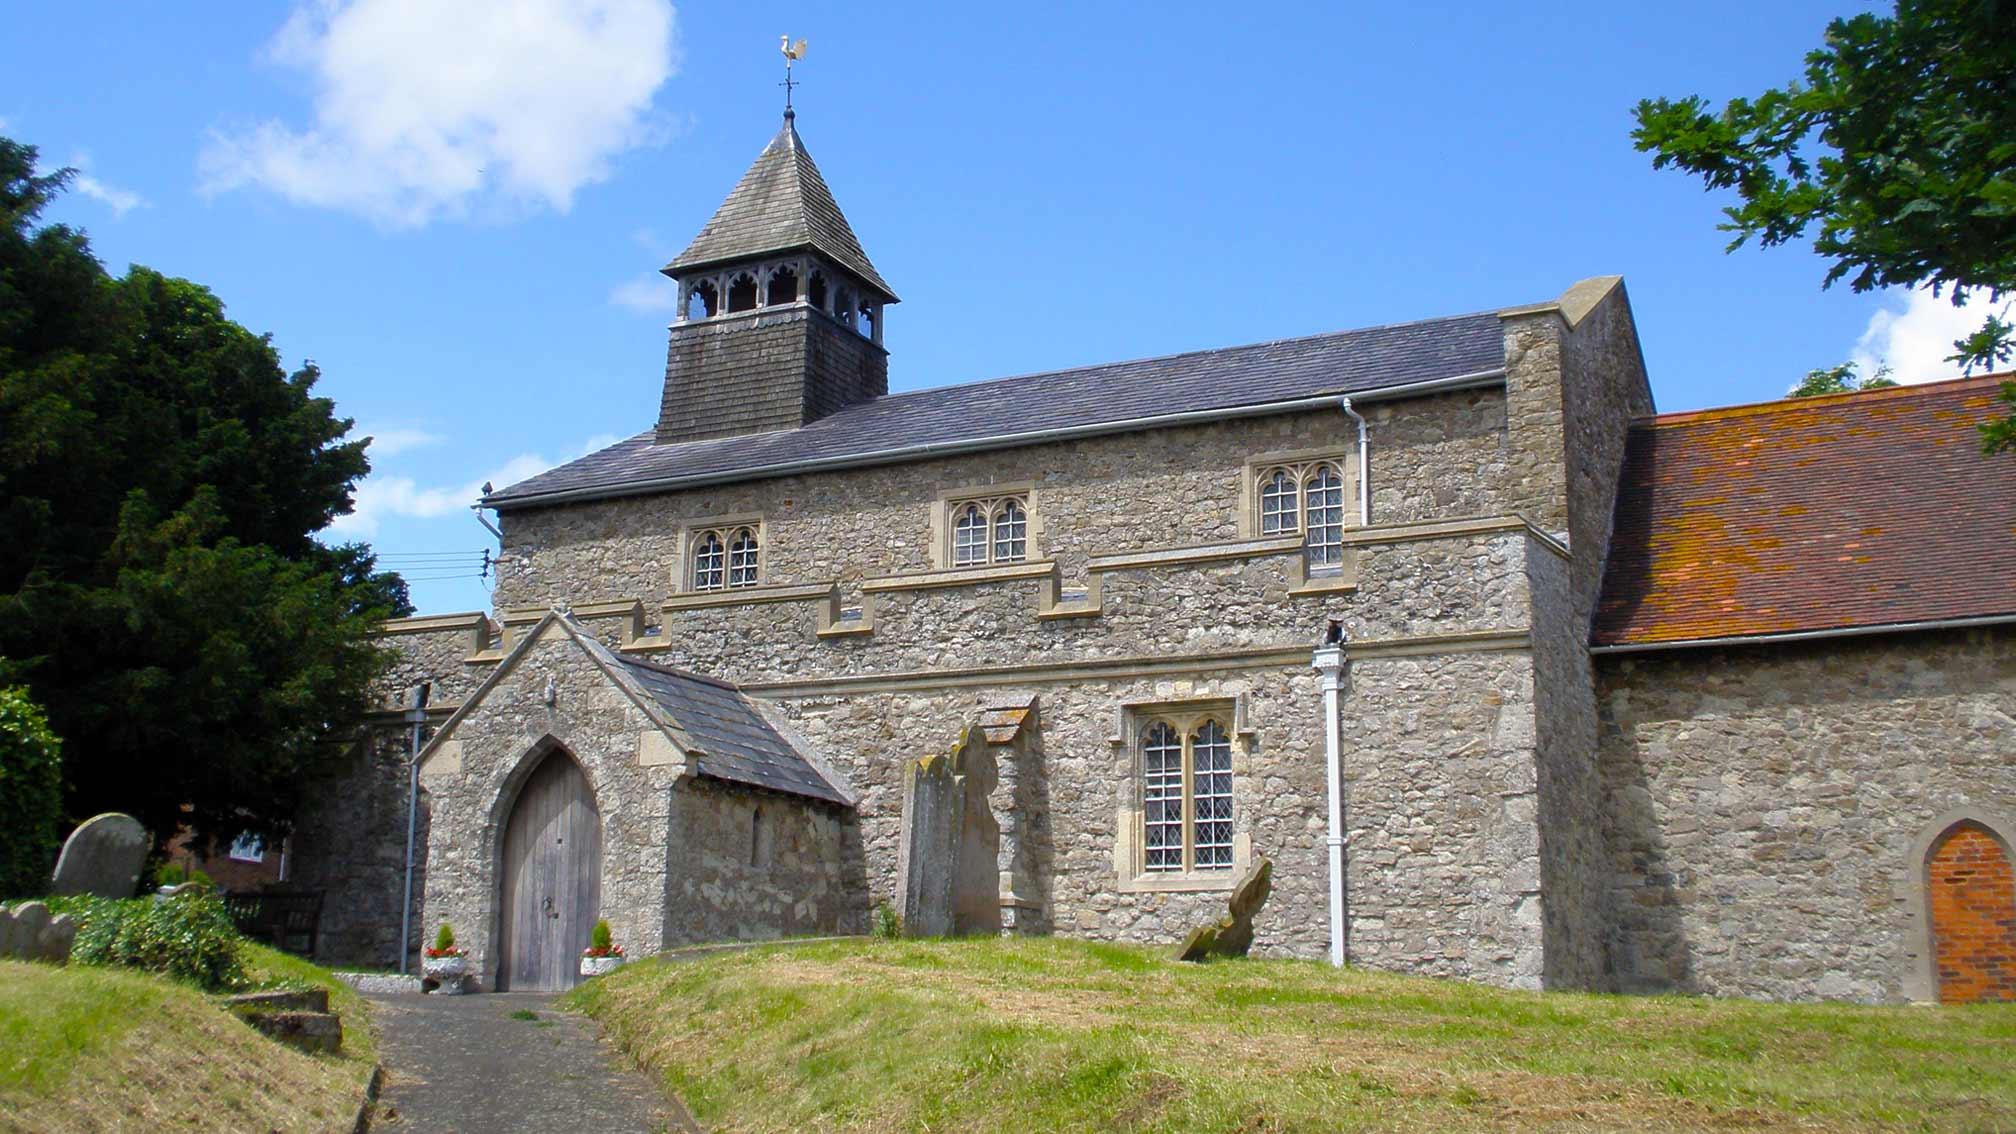 A stone built church on a summer day